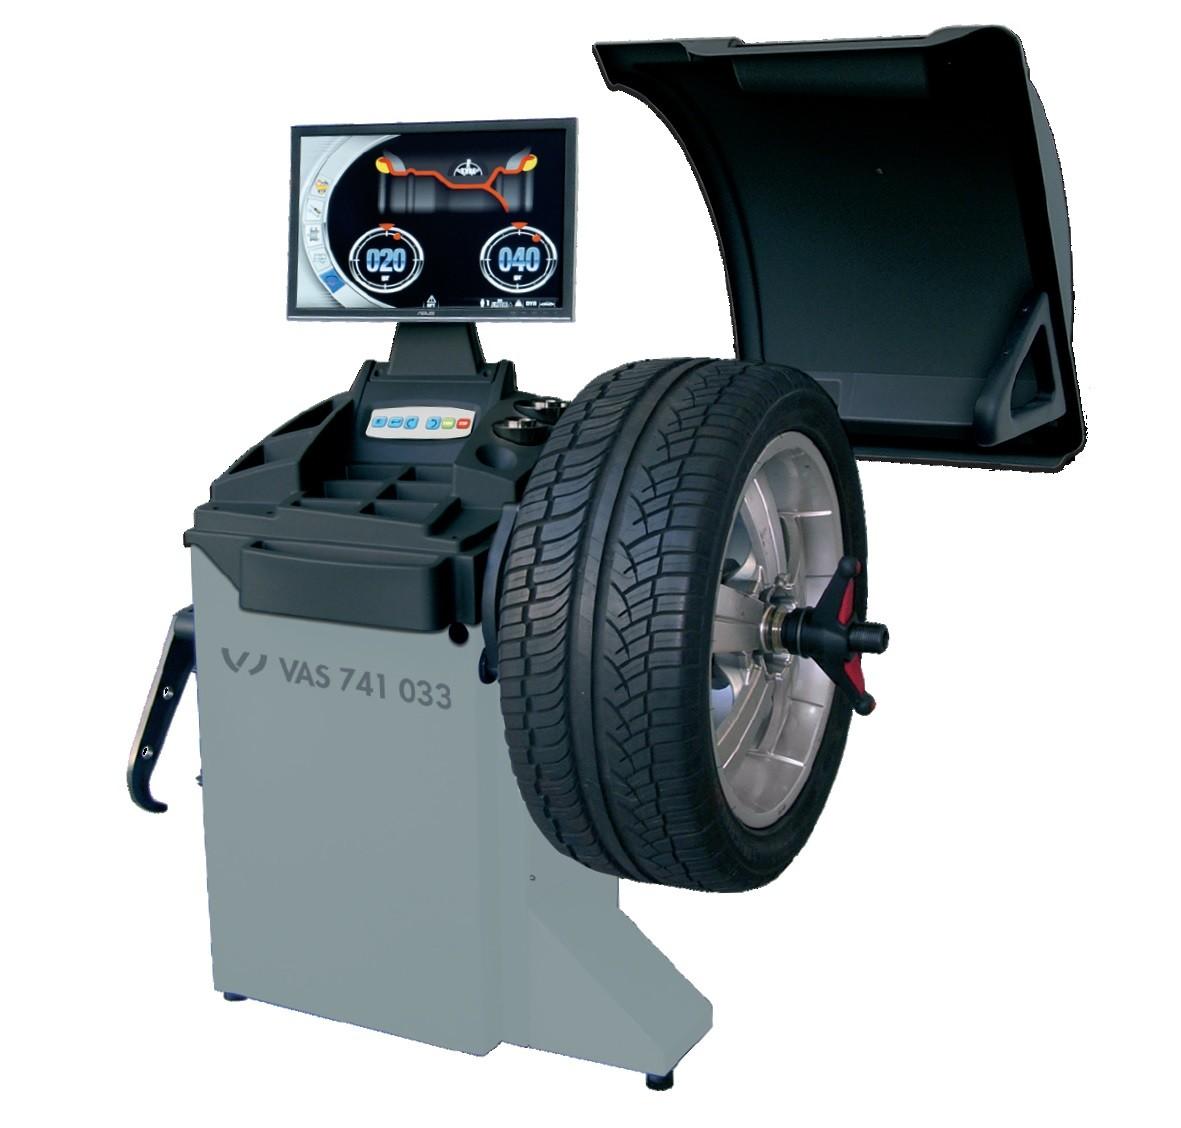 VAS 741 033 - Masina de echilibrat electronica, cu monitor LCD